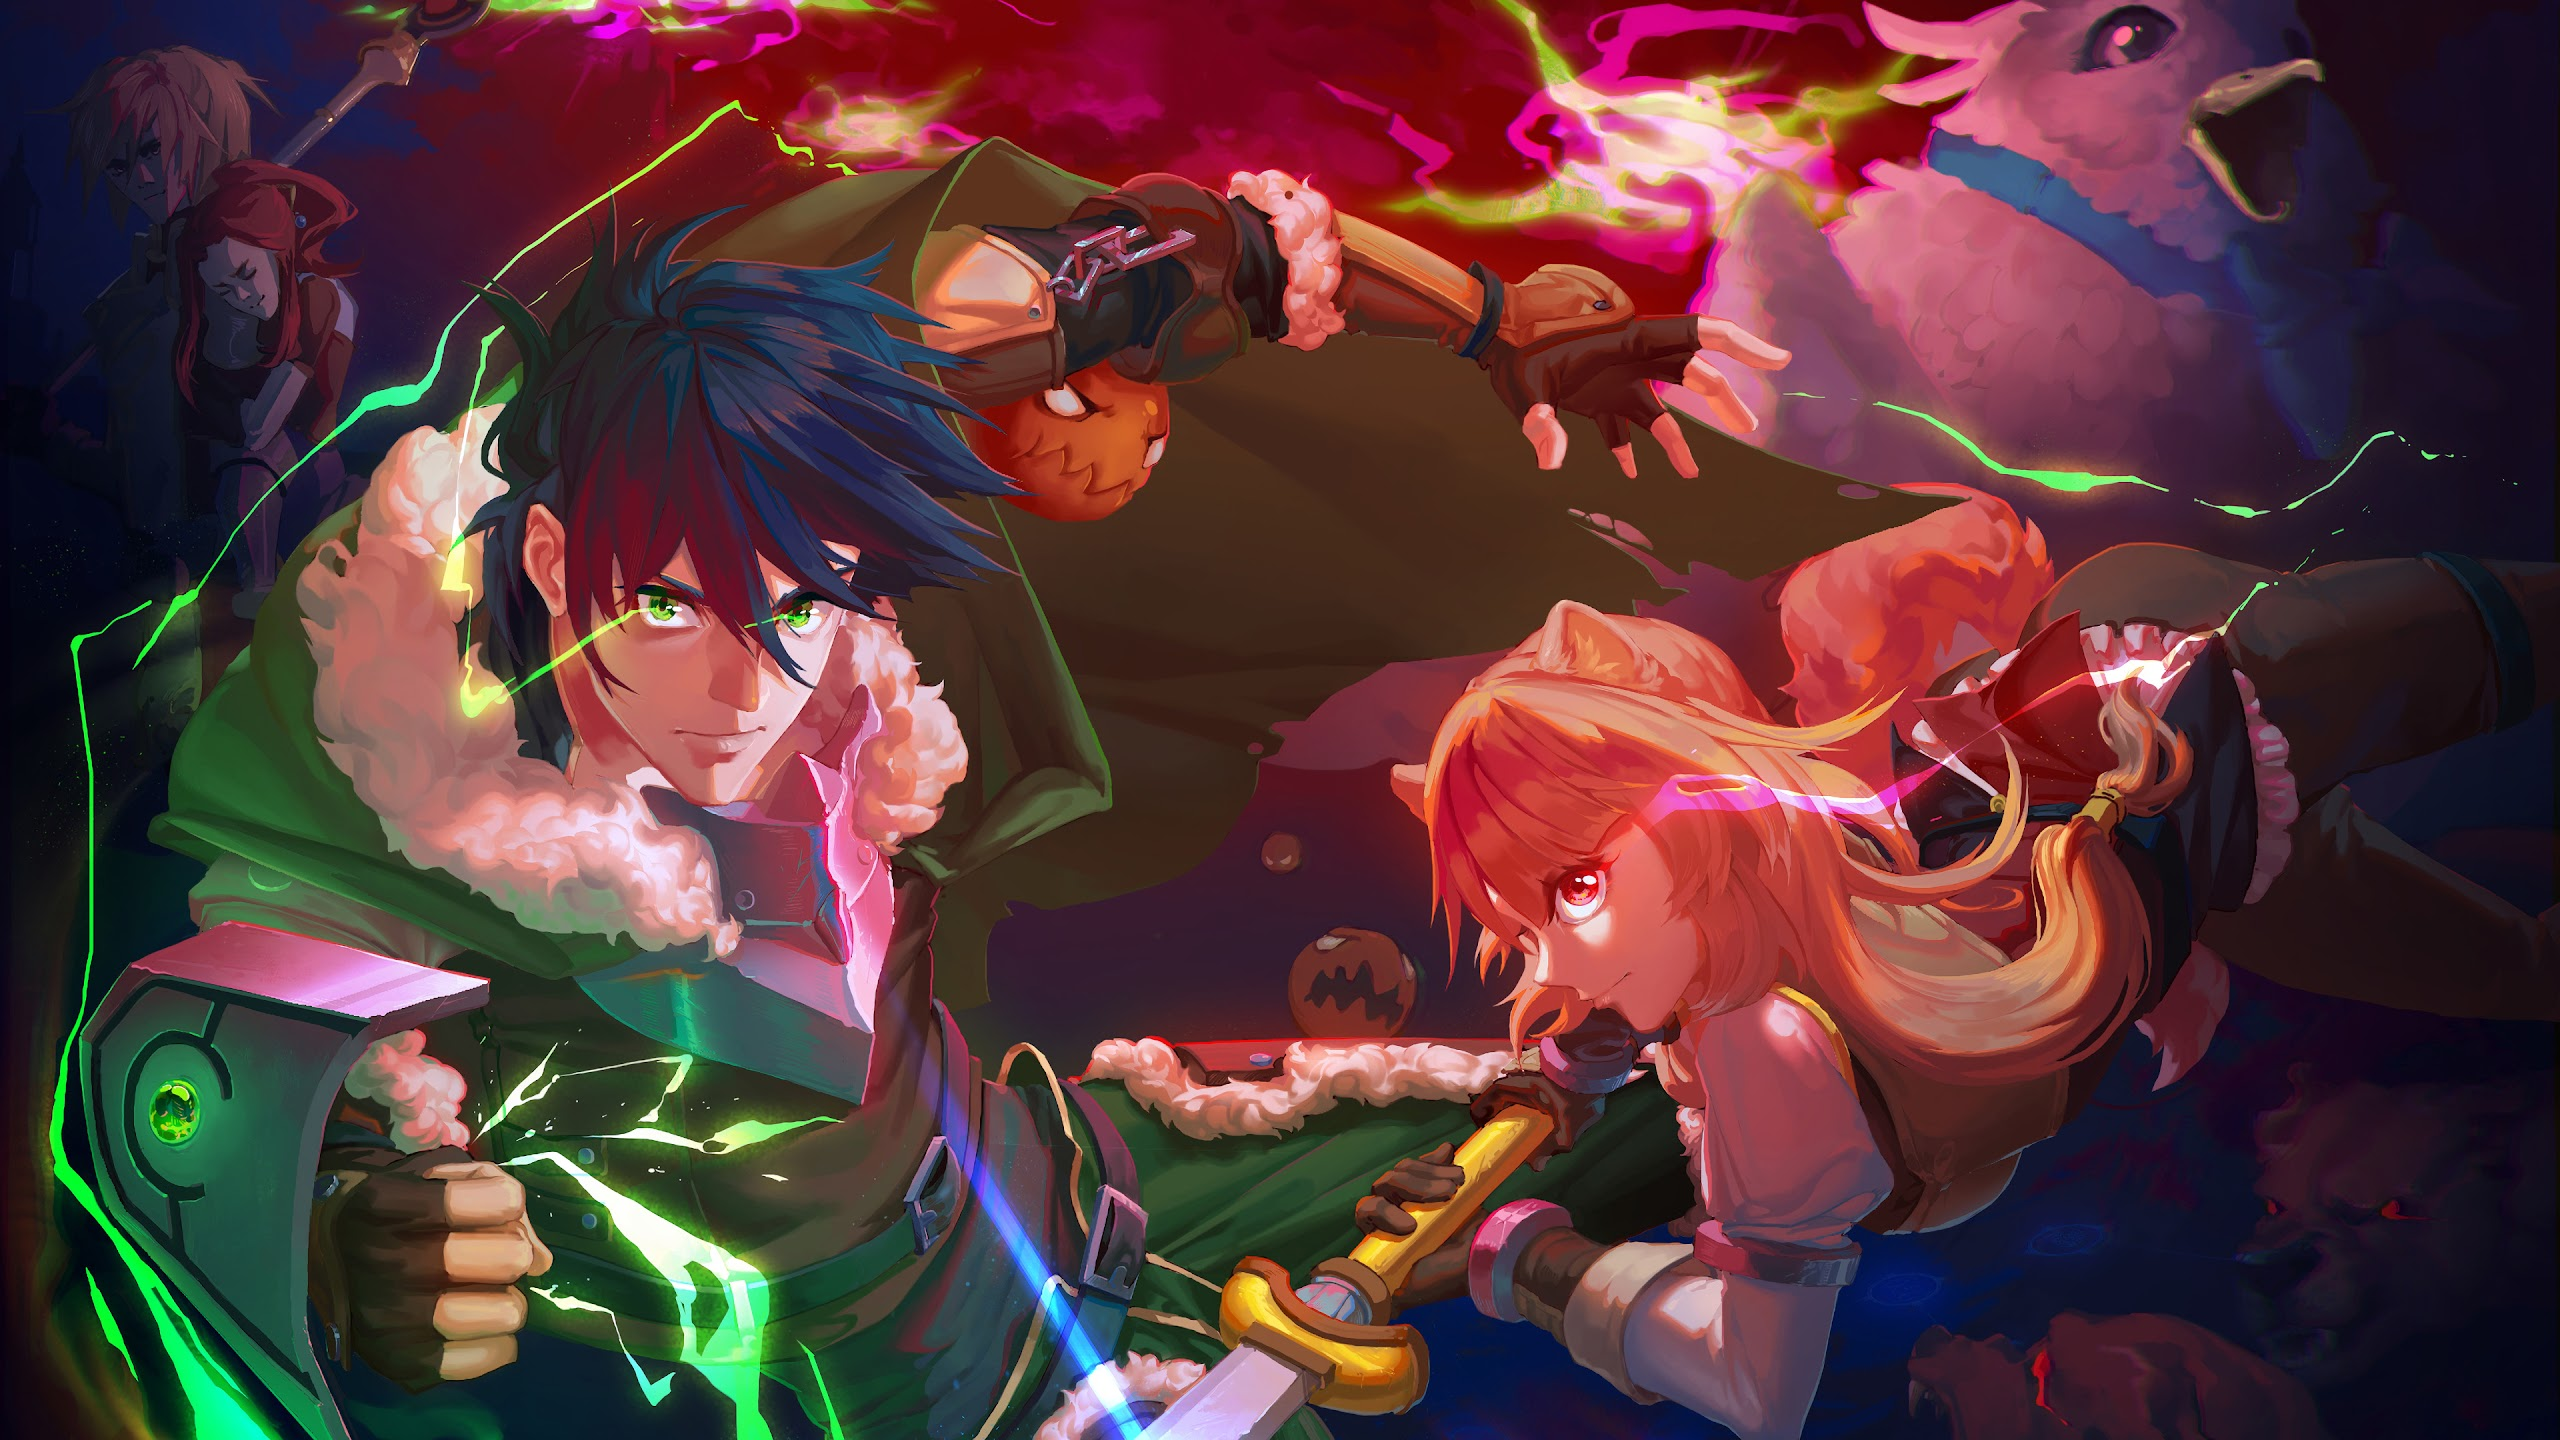 The Rising Of The Shield Hero Wallpaper Iphone - Gambarku